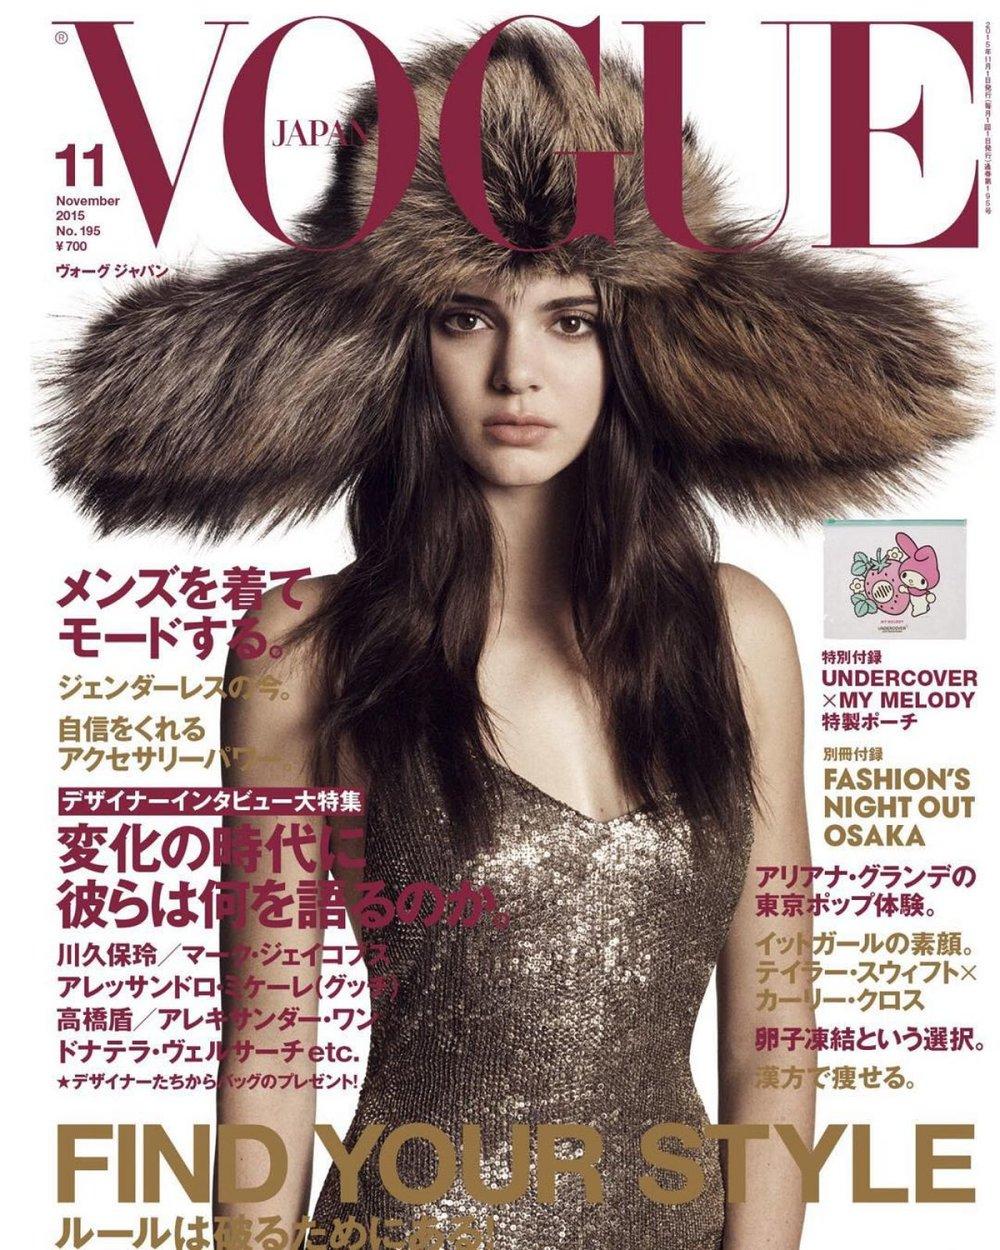 Giovanna-Battaglia-Vogue-Japan-November-2015-Cover-Kendall-Jenner-Cover.jpg